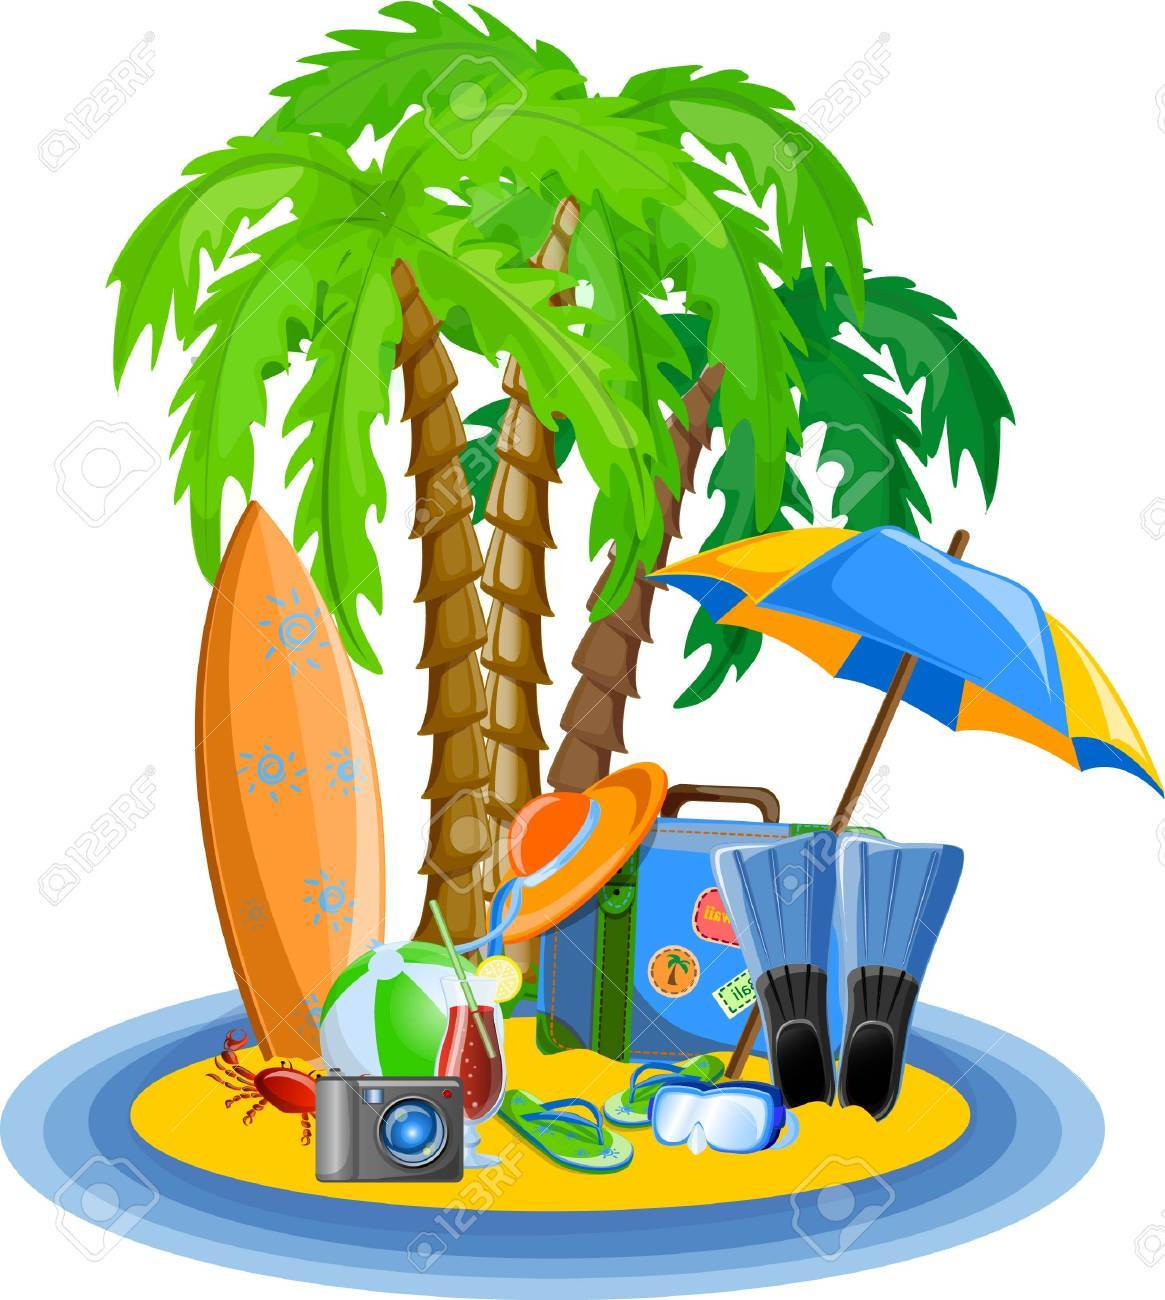 Travel icons, palm, ball, lounge, umbrella, flip-flops Stock Vector - 22812448